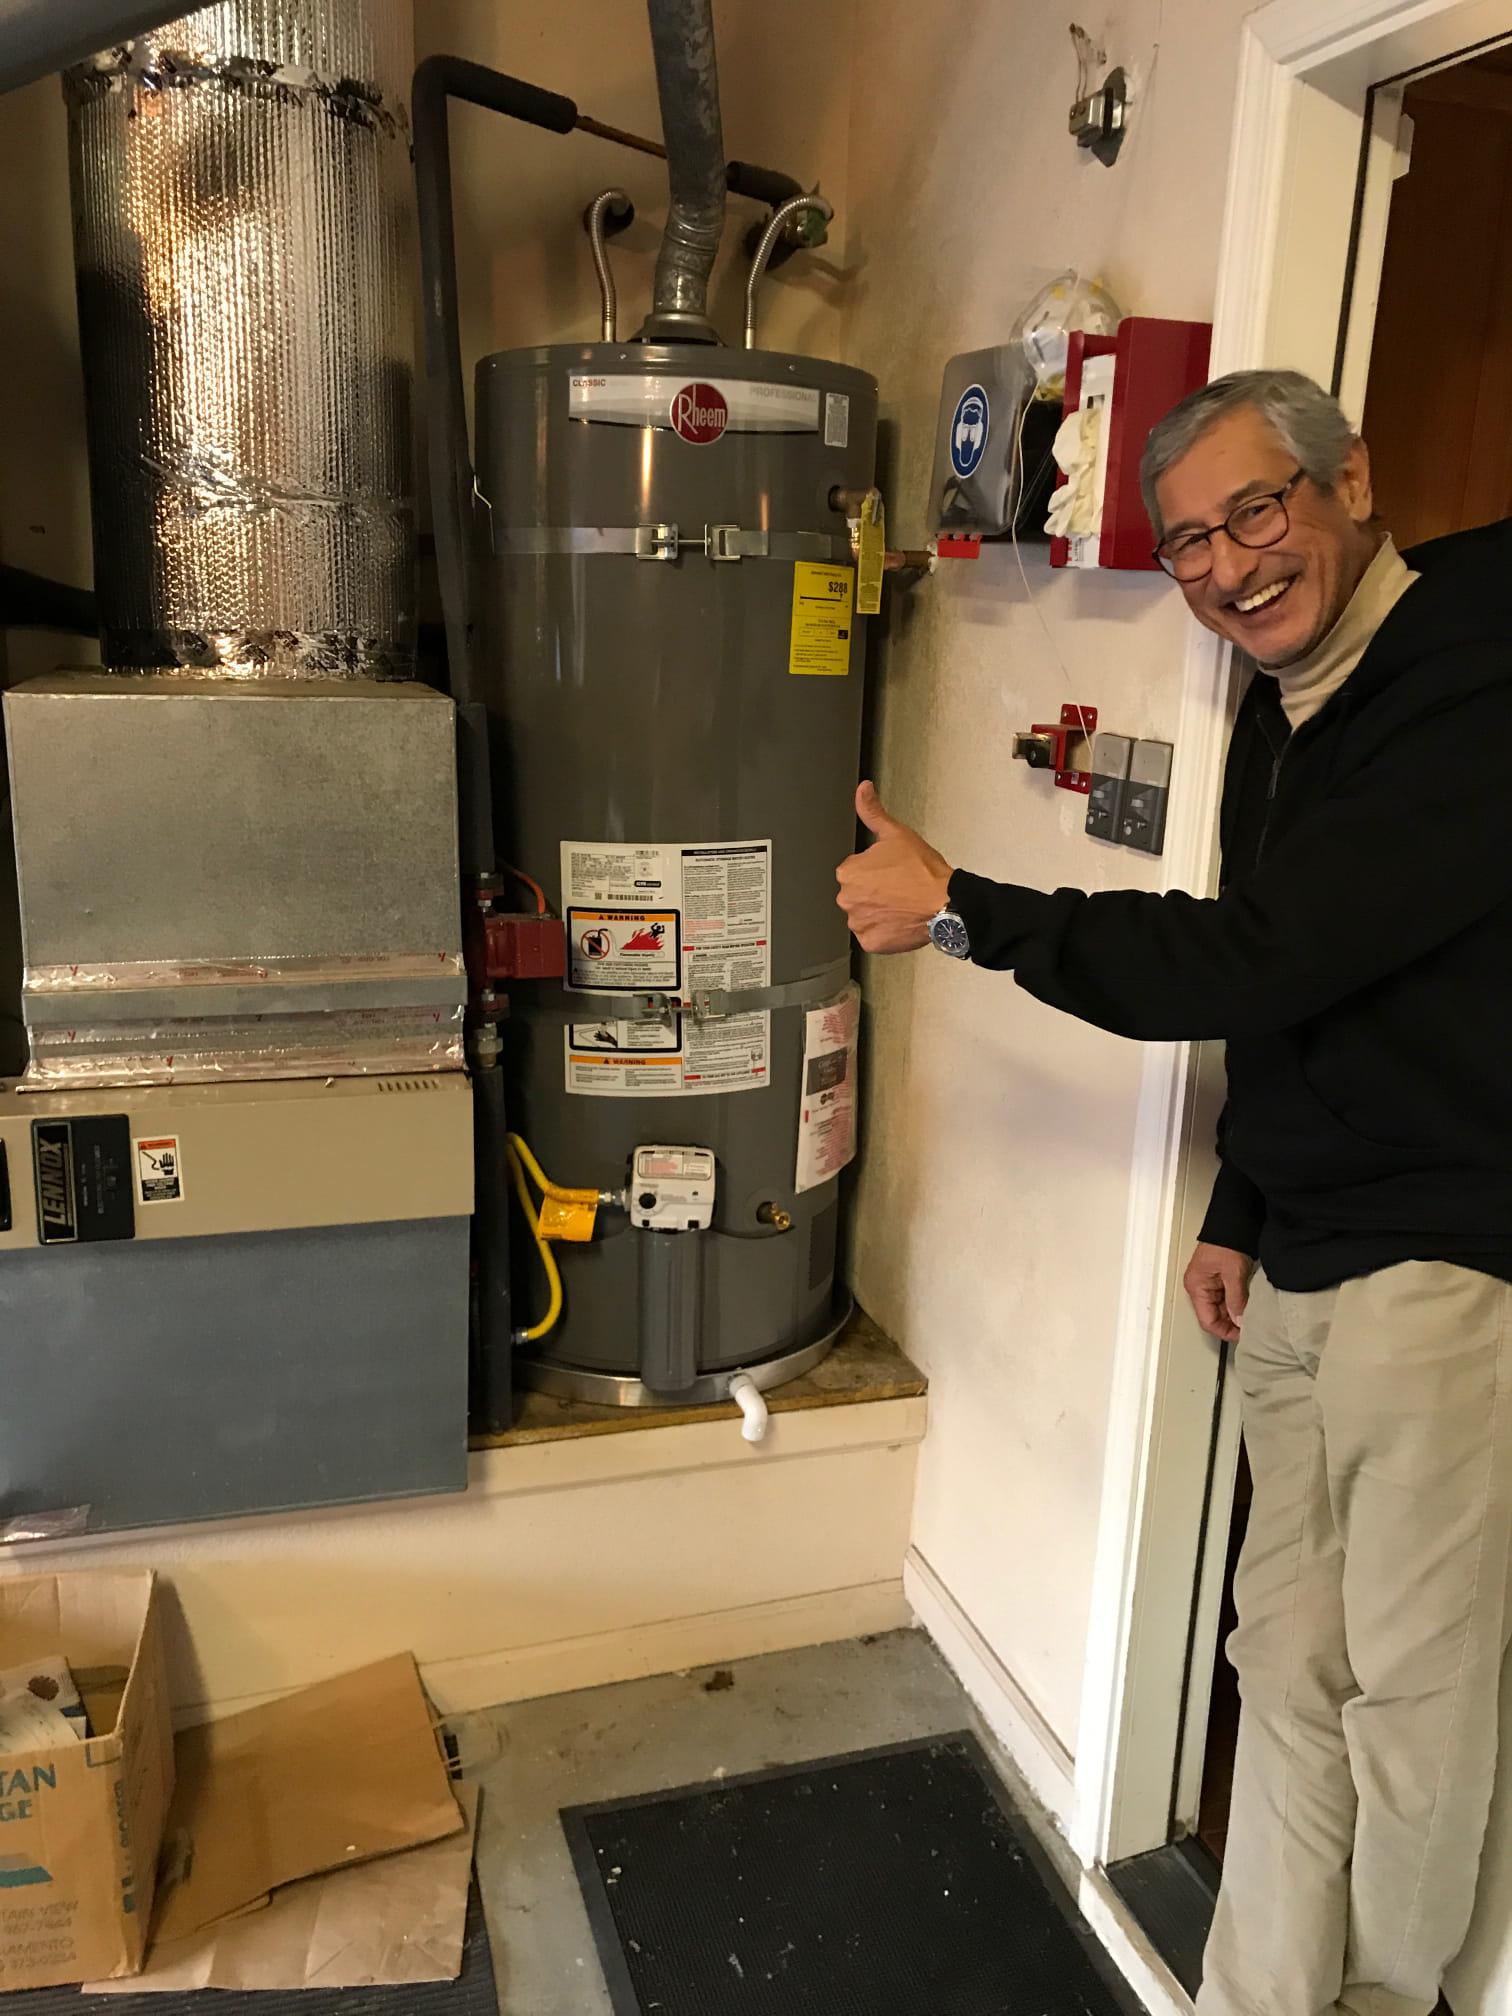 50 Gallon Water Heater Replacement Stockton, CA